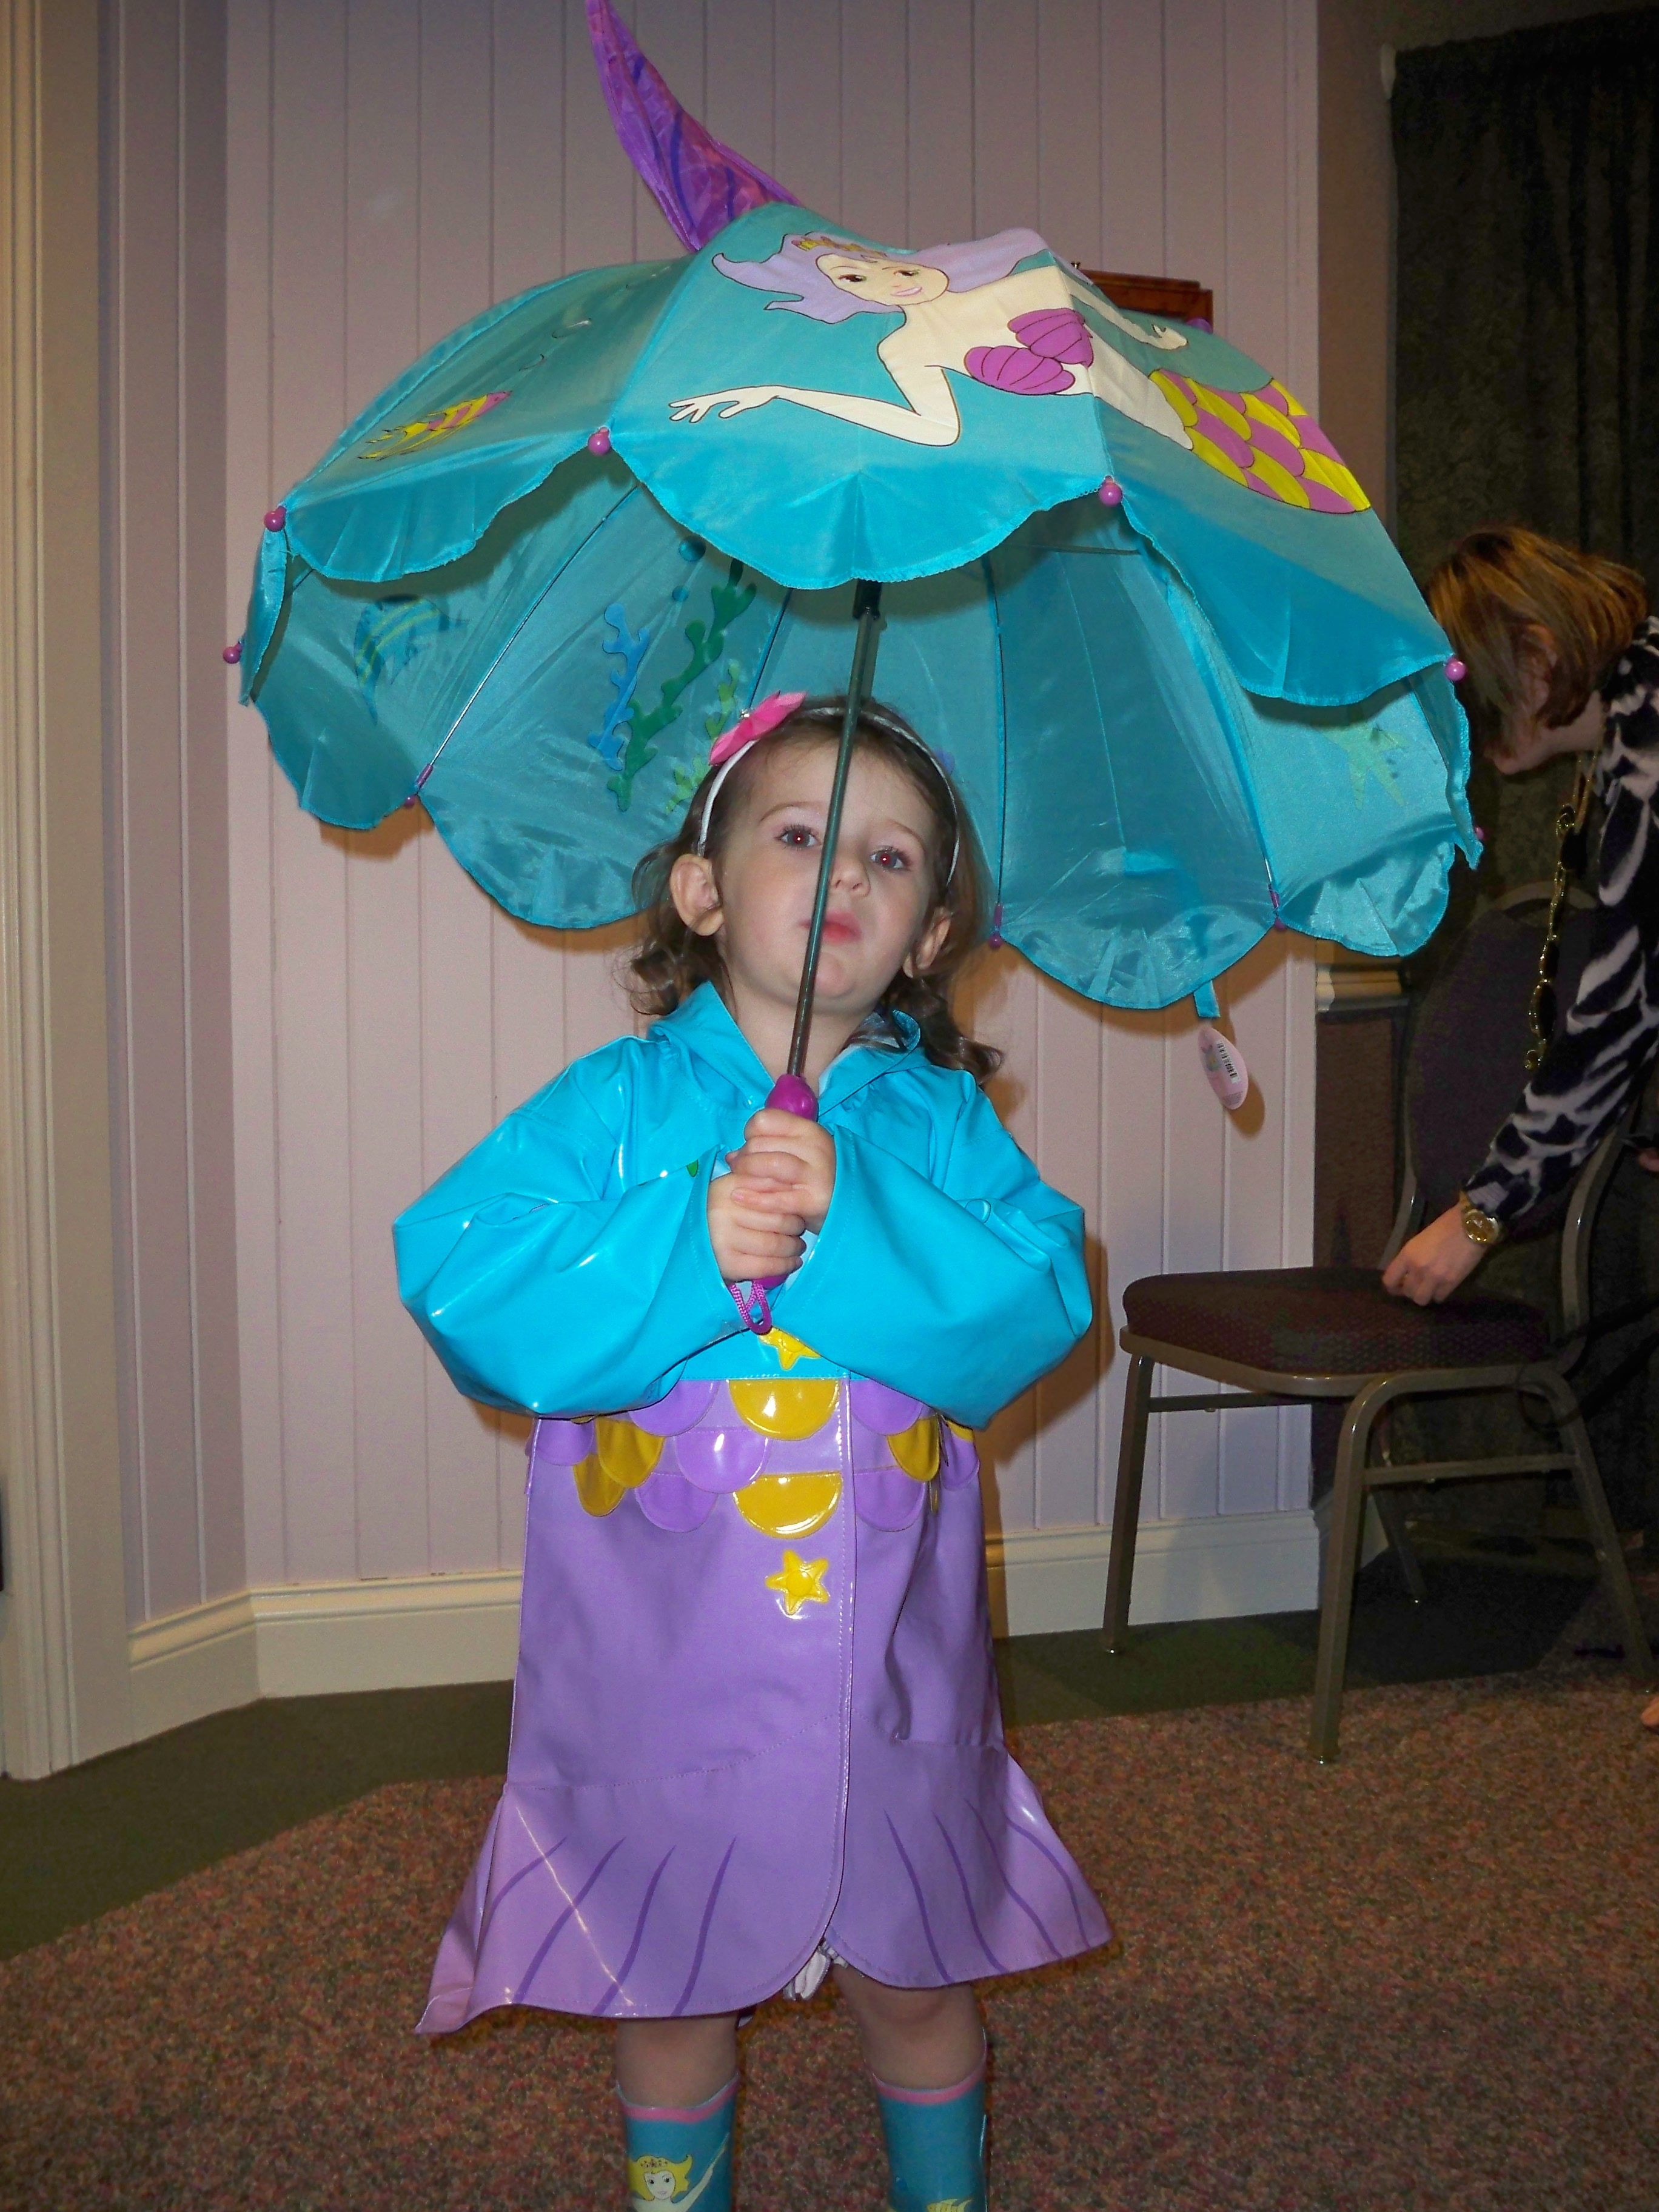 The Little Mermaid Raincoat Boots Amp Umbrella By Kidorable